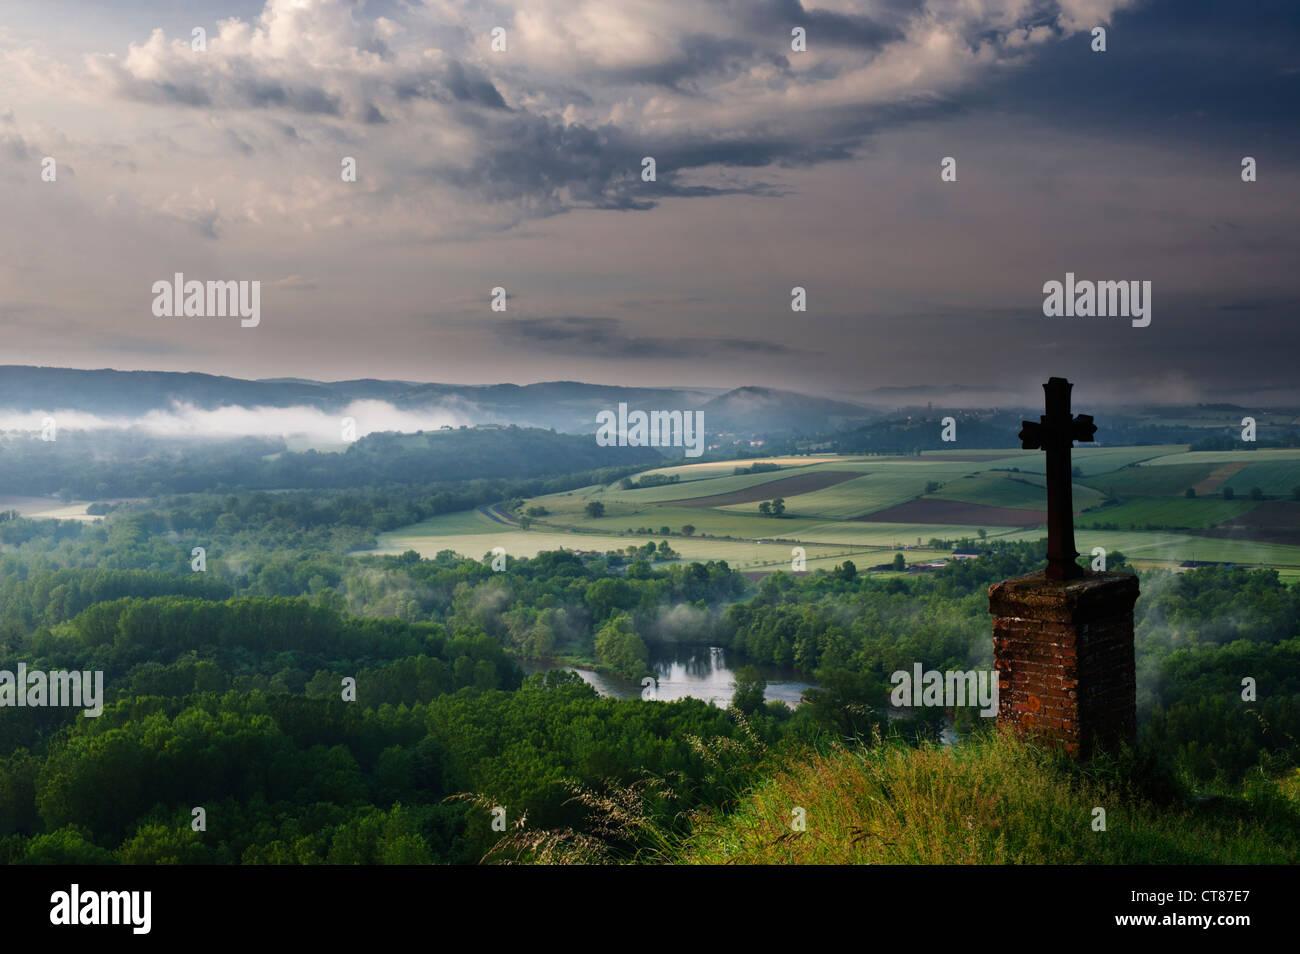 misty-dawn-over-floodplain-of-lallier-river-from-pic-de-nonette-a-CT87E7.jpg